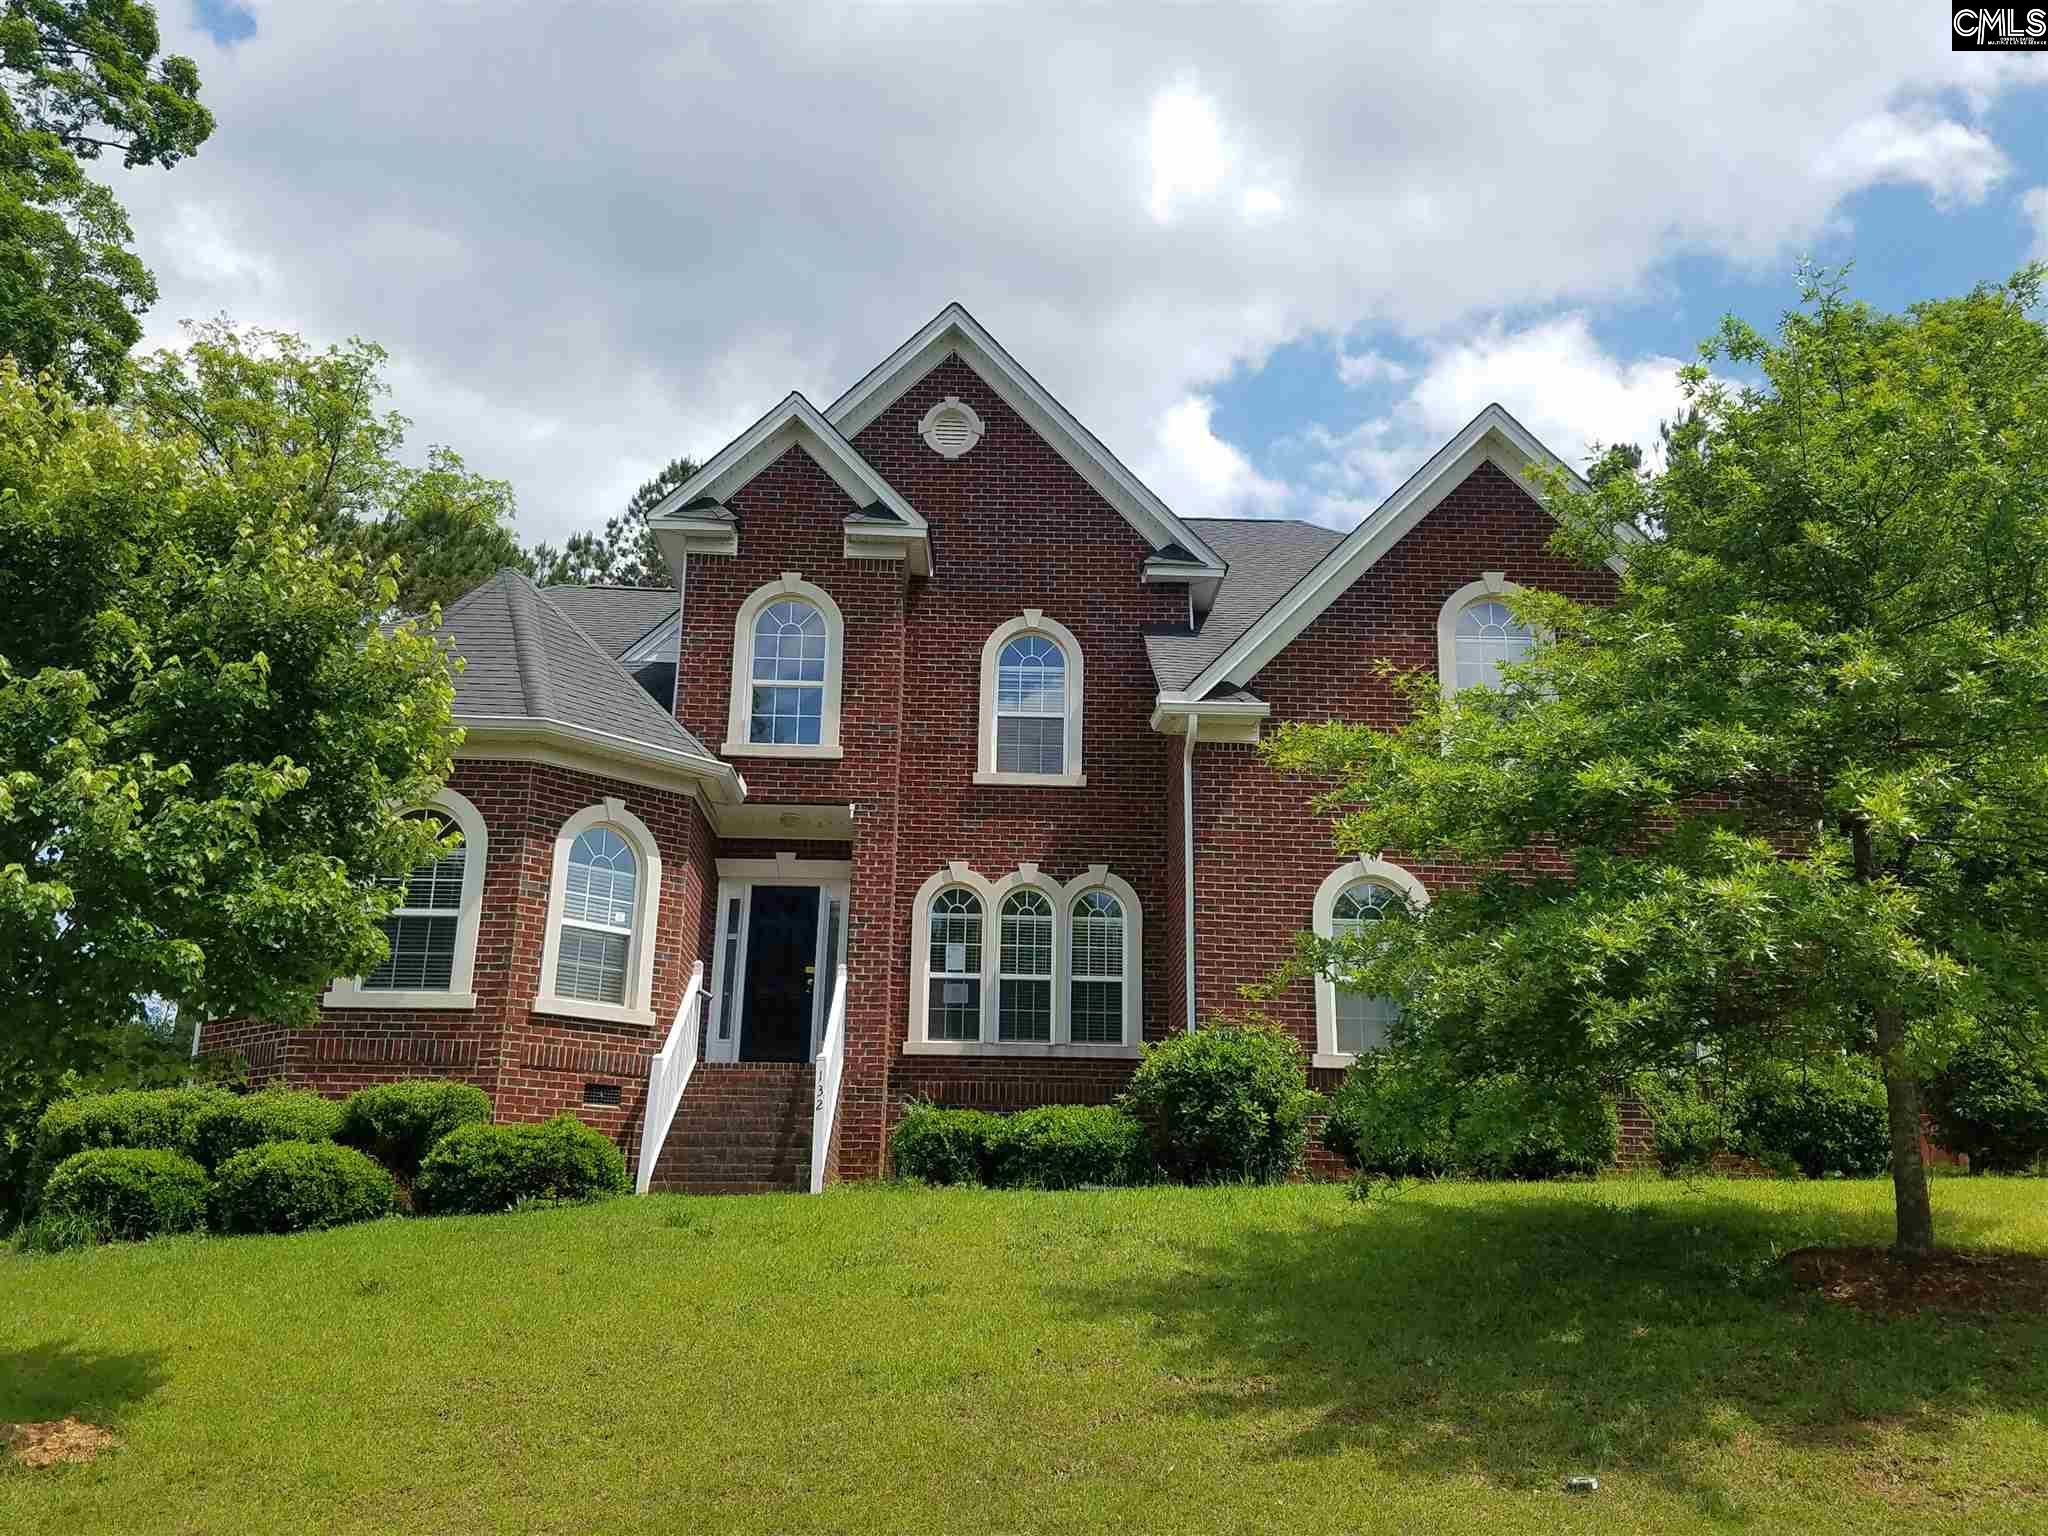 132 Scarlet Oak Lexington, SC 29072